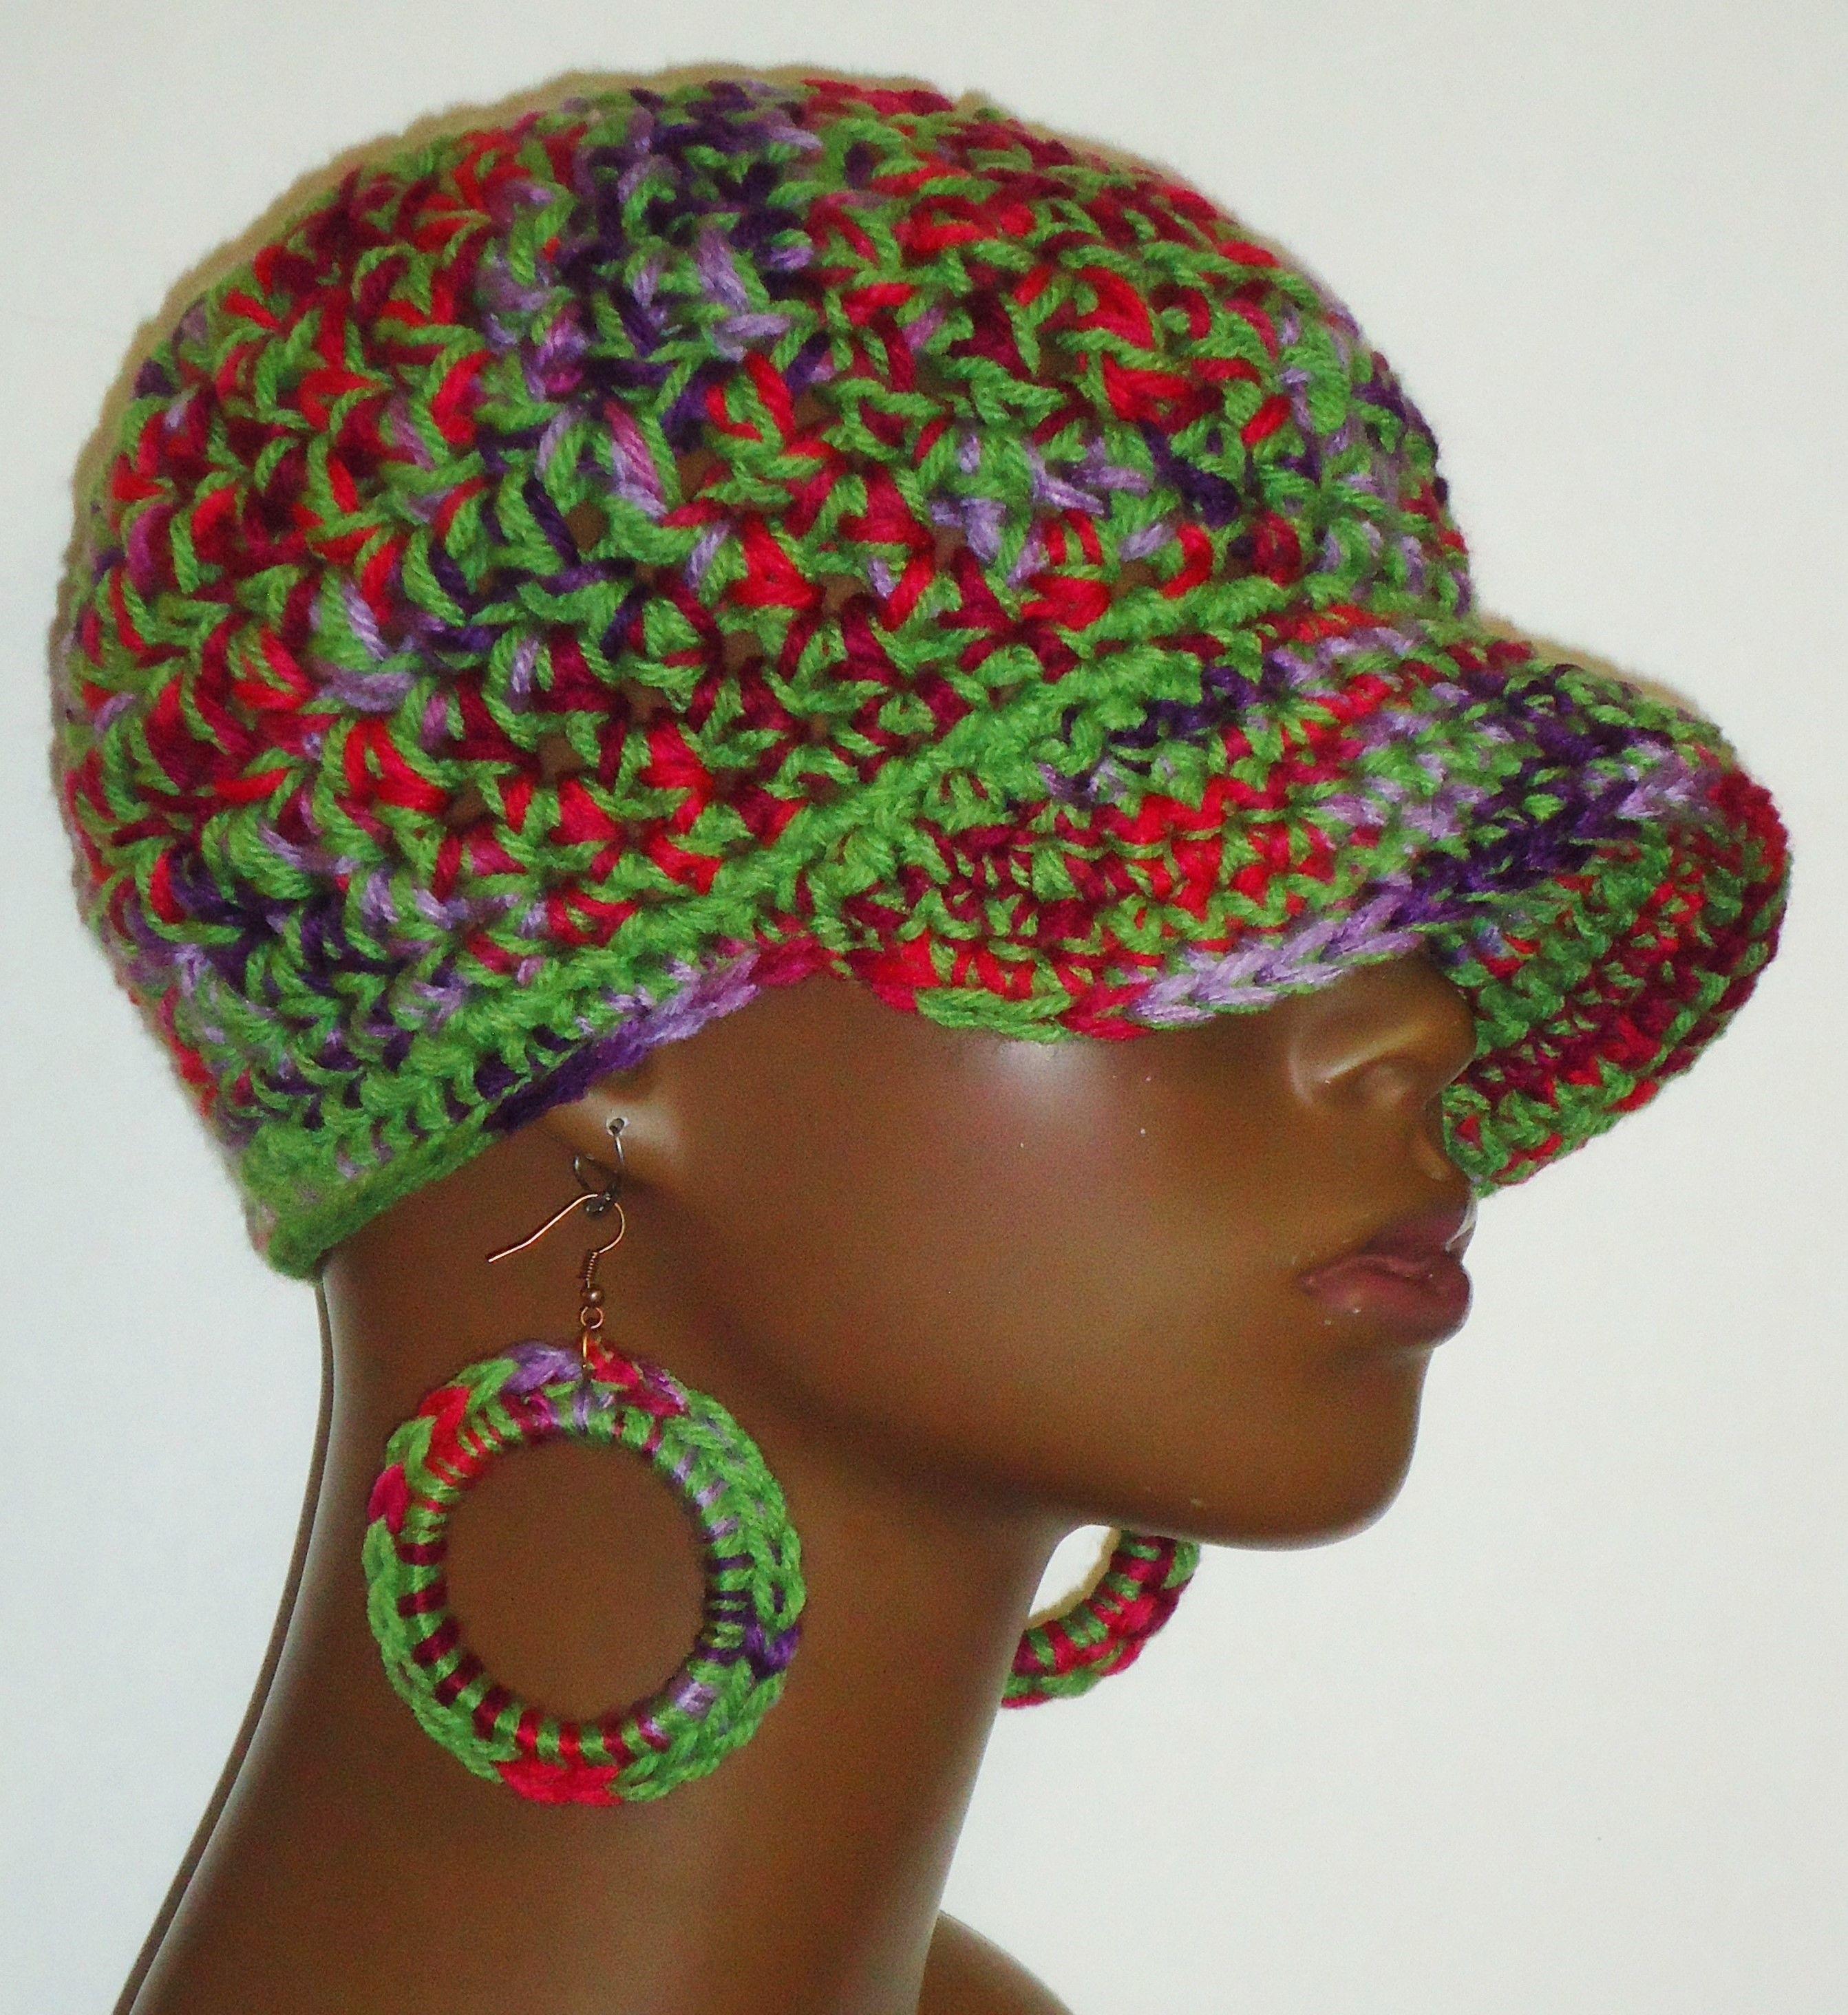 Crochet Baseball Cap and Earrings by Razonda Lee